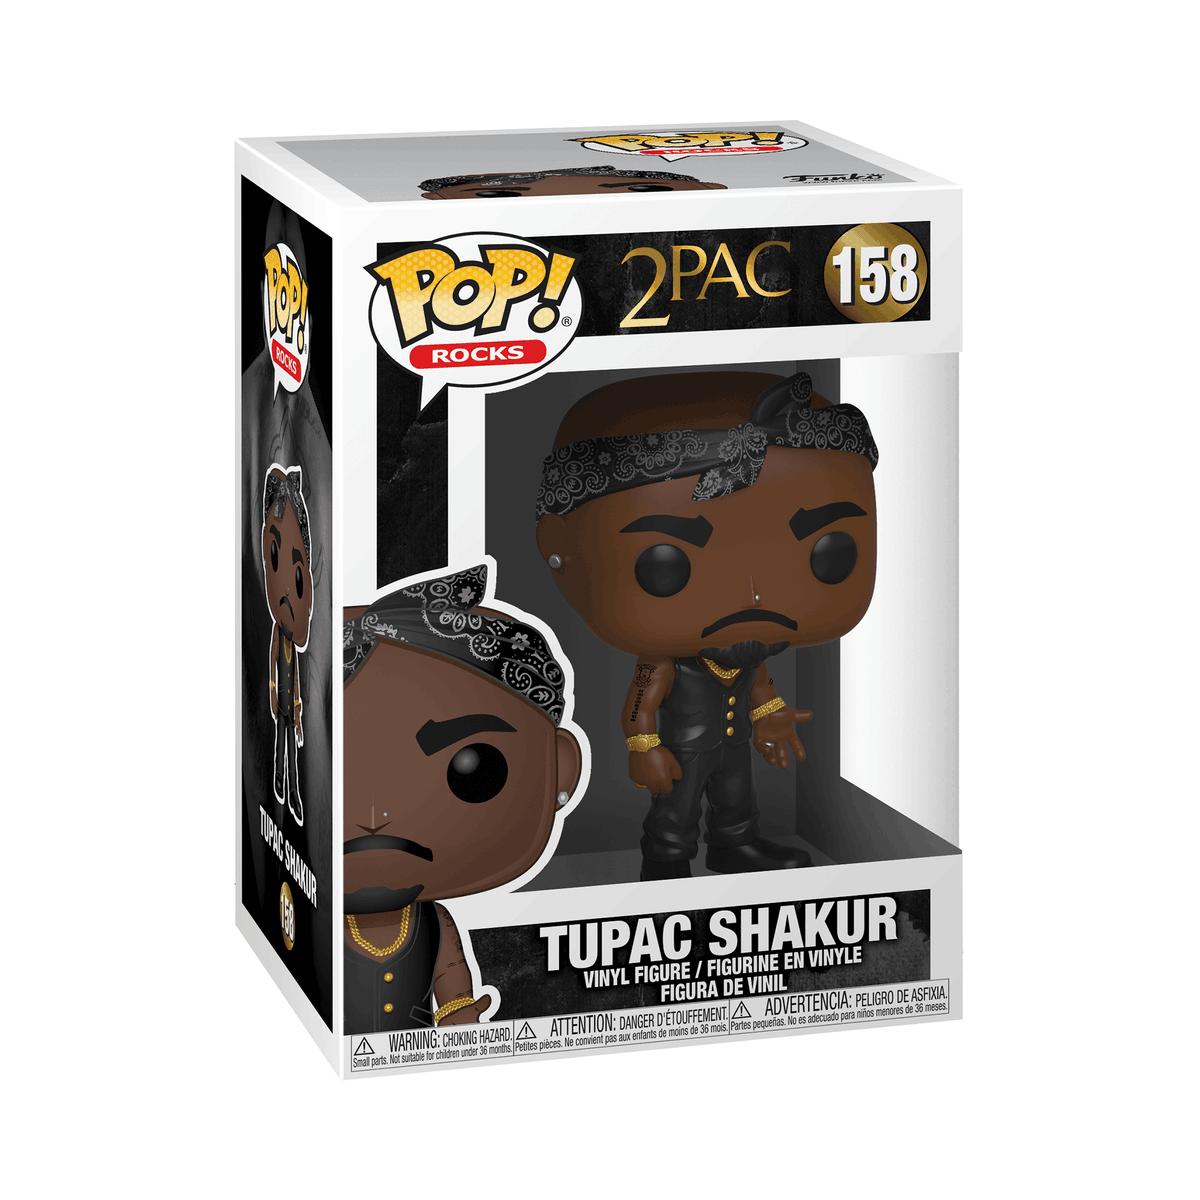 RT & follow @OriginalFunko for the chance to win a Tupac Shakur Pop! bit.ly/3ebh68N